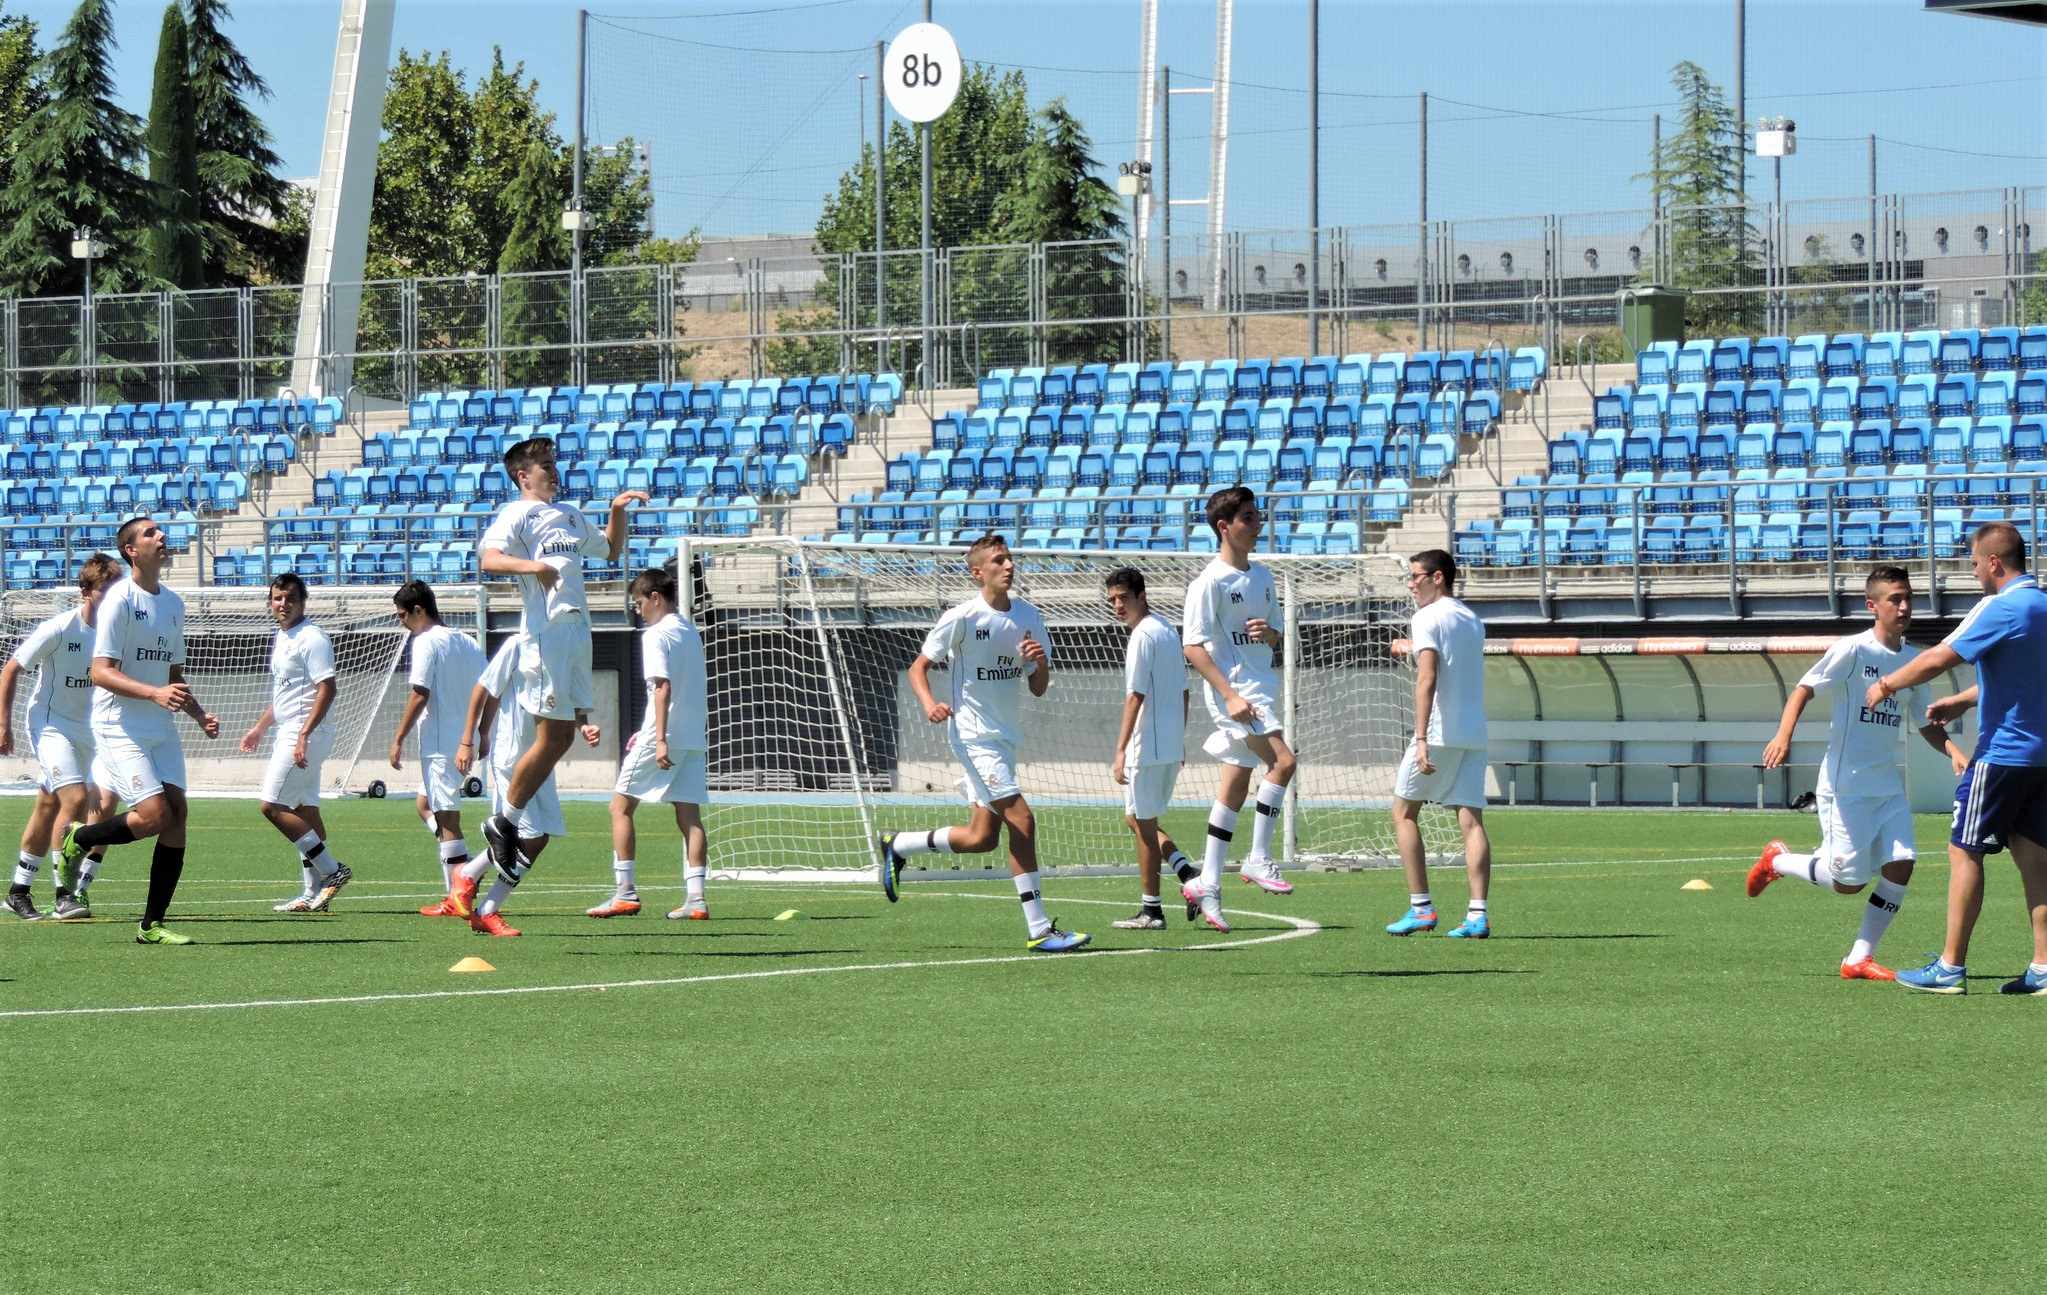 Trening seniora, skola fudbala Real Madrid